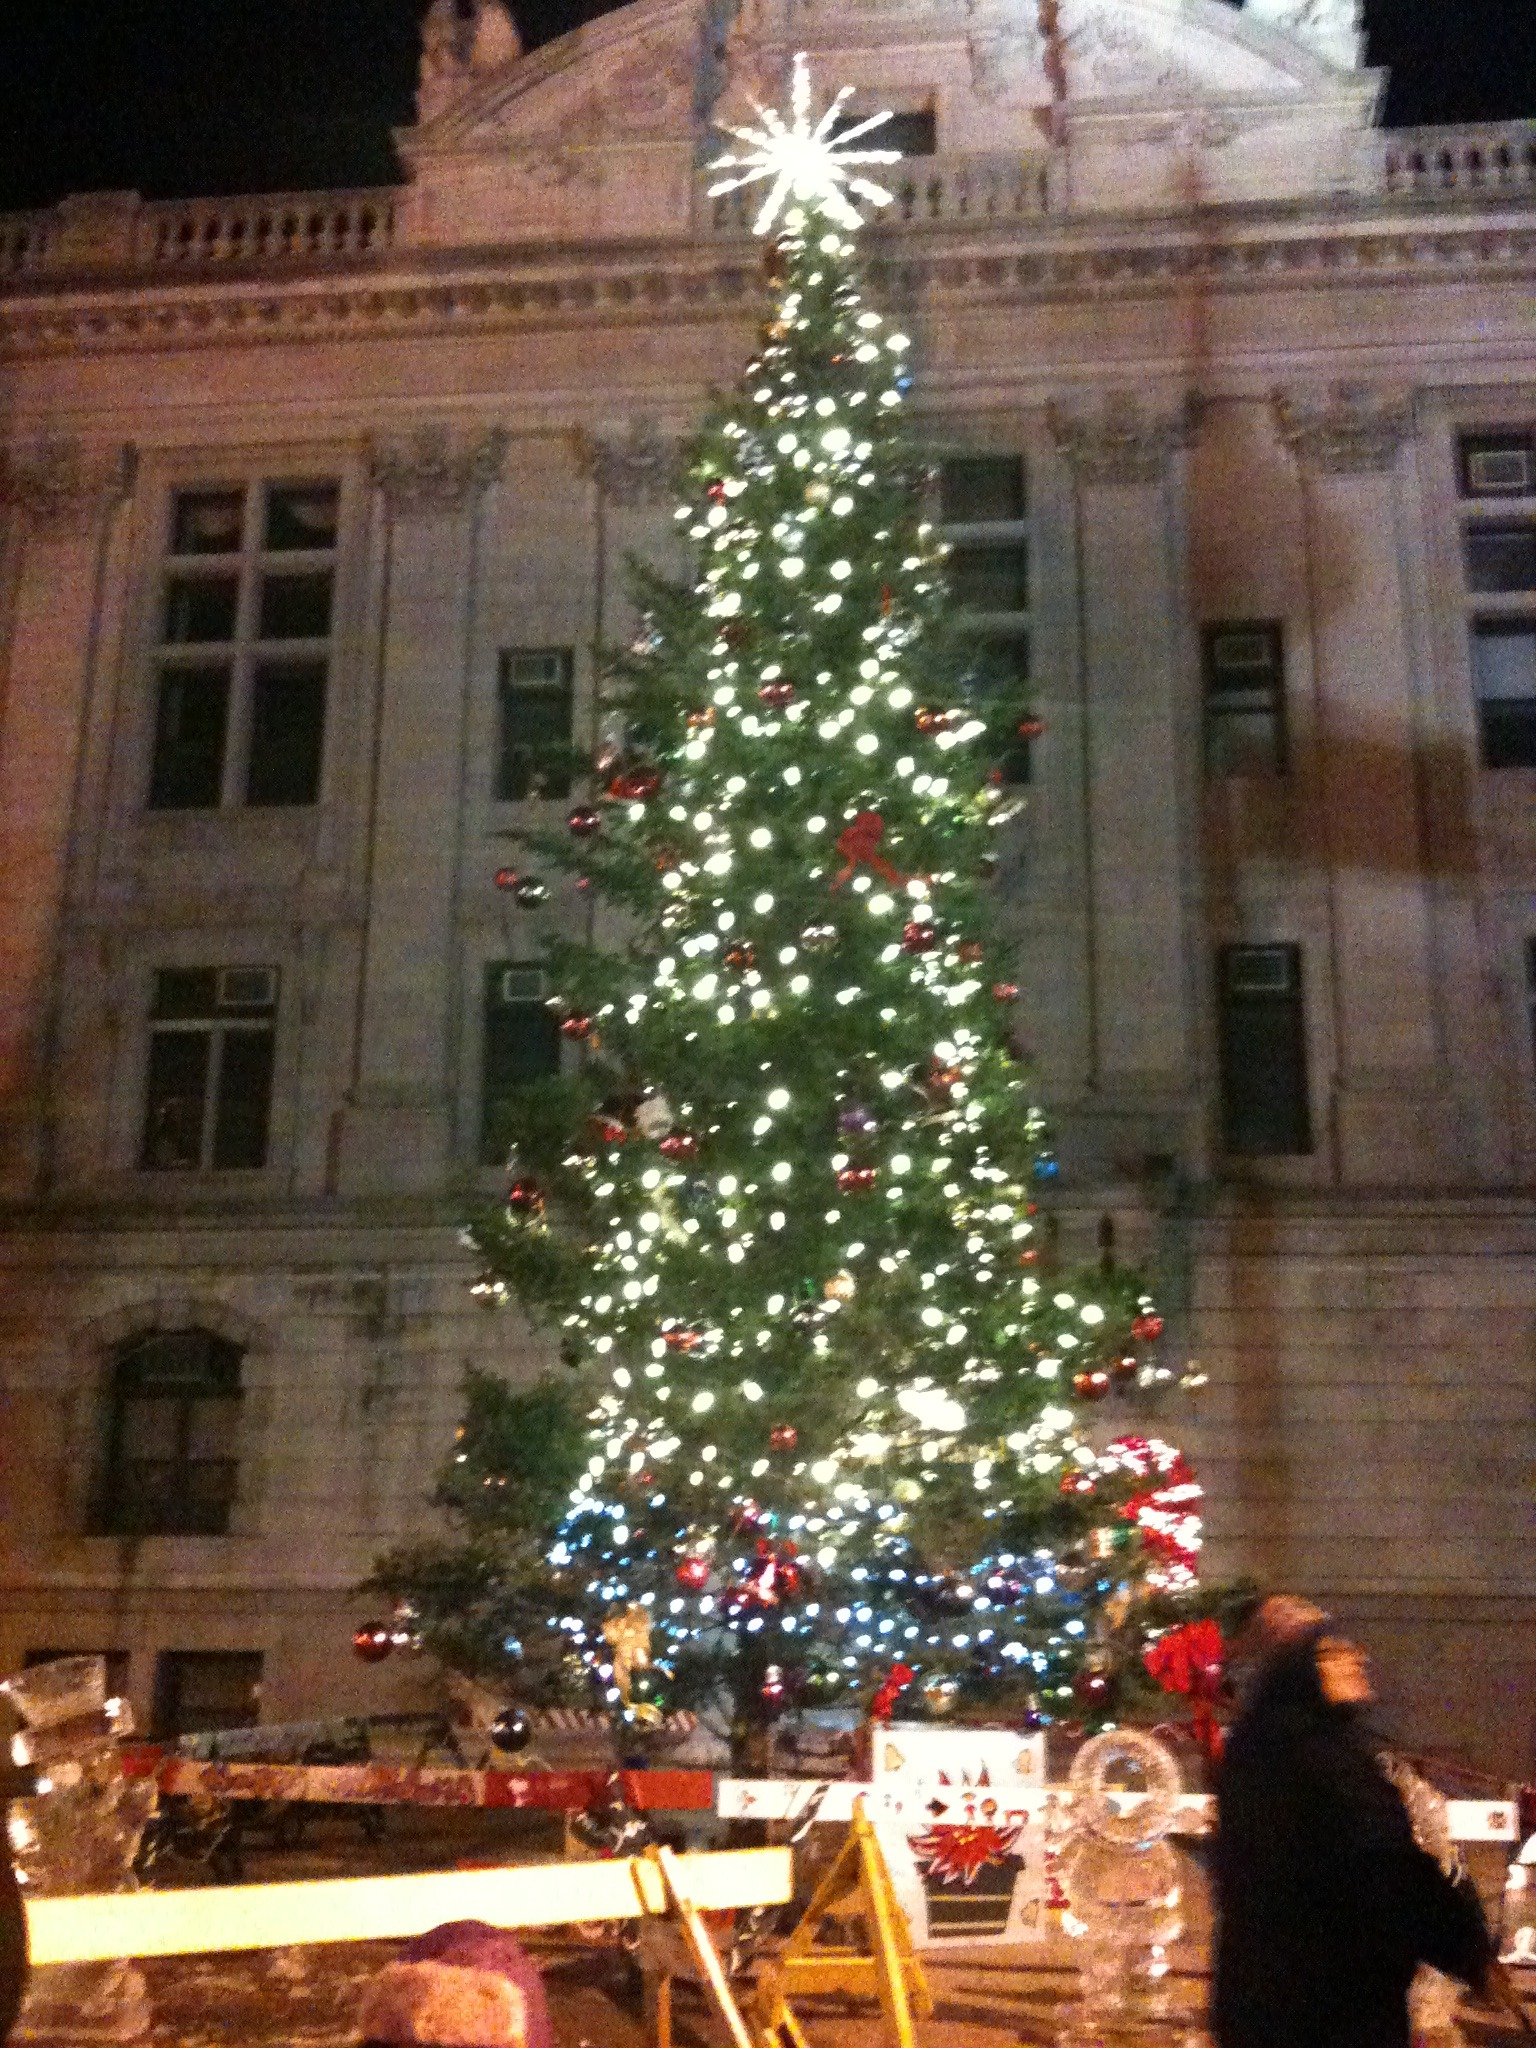 ef11803369357a5640cf_lit_up_christmastree.jpg